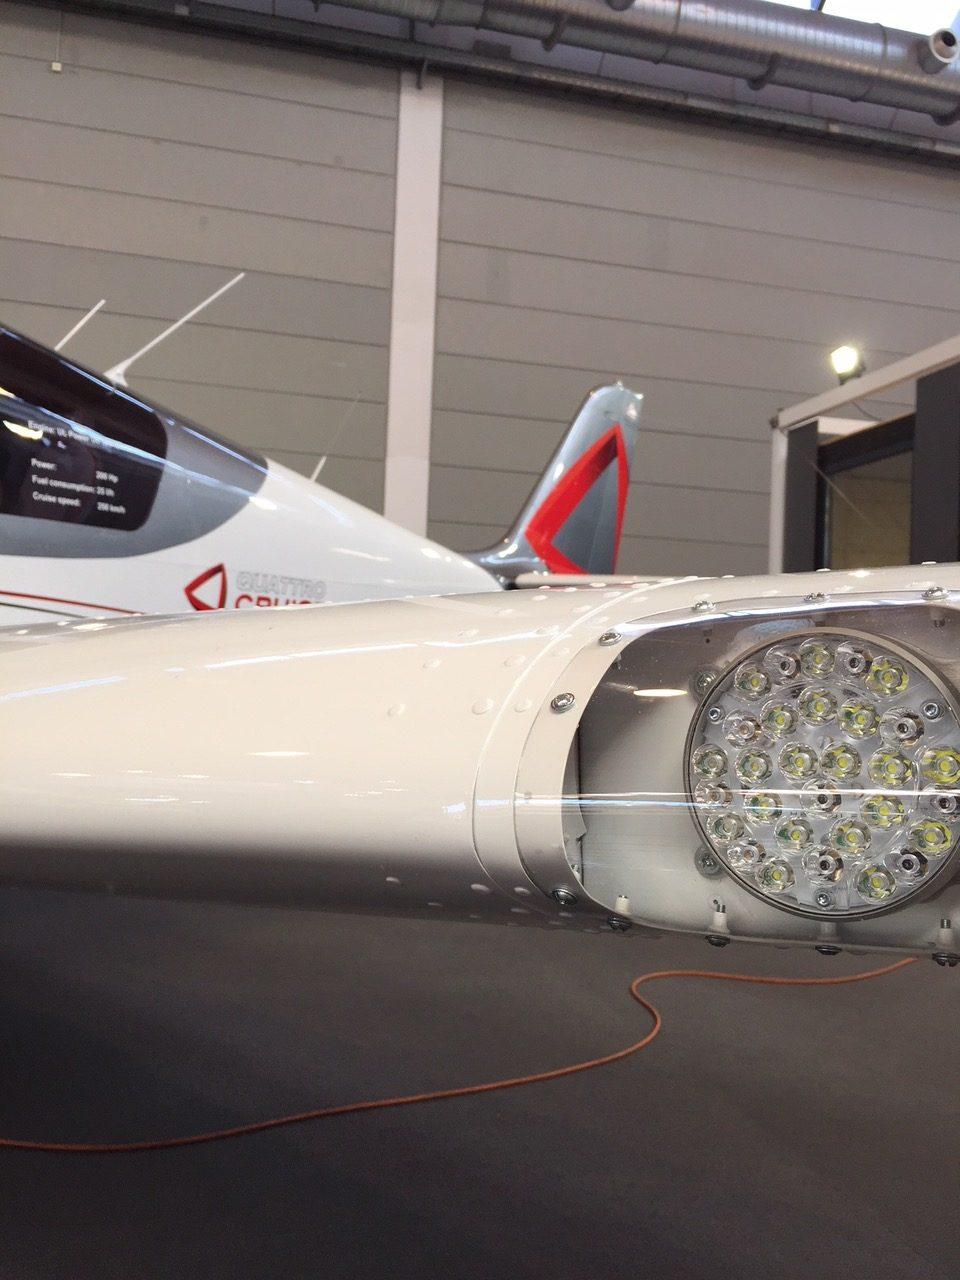 Aero Friedrichshafen Aveo Landing-Taxi Lights